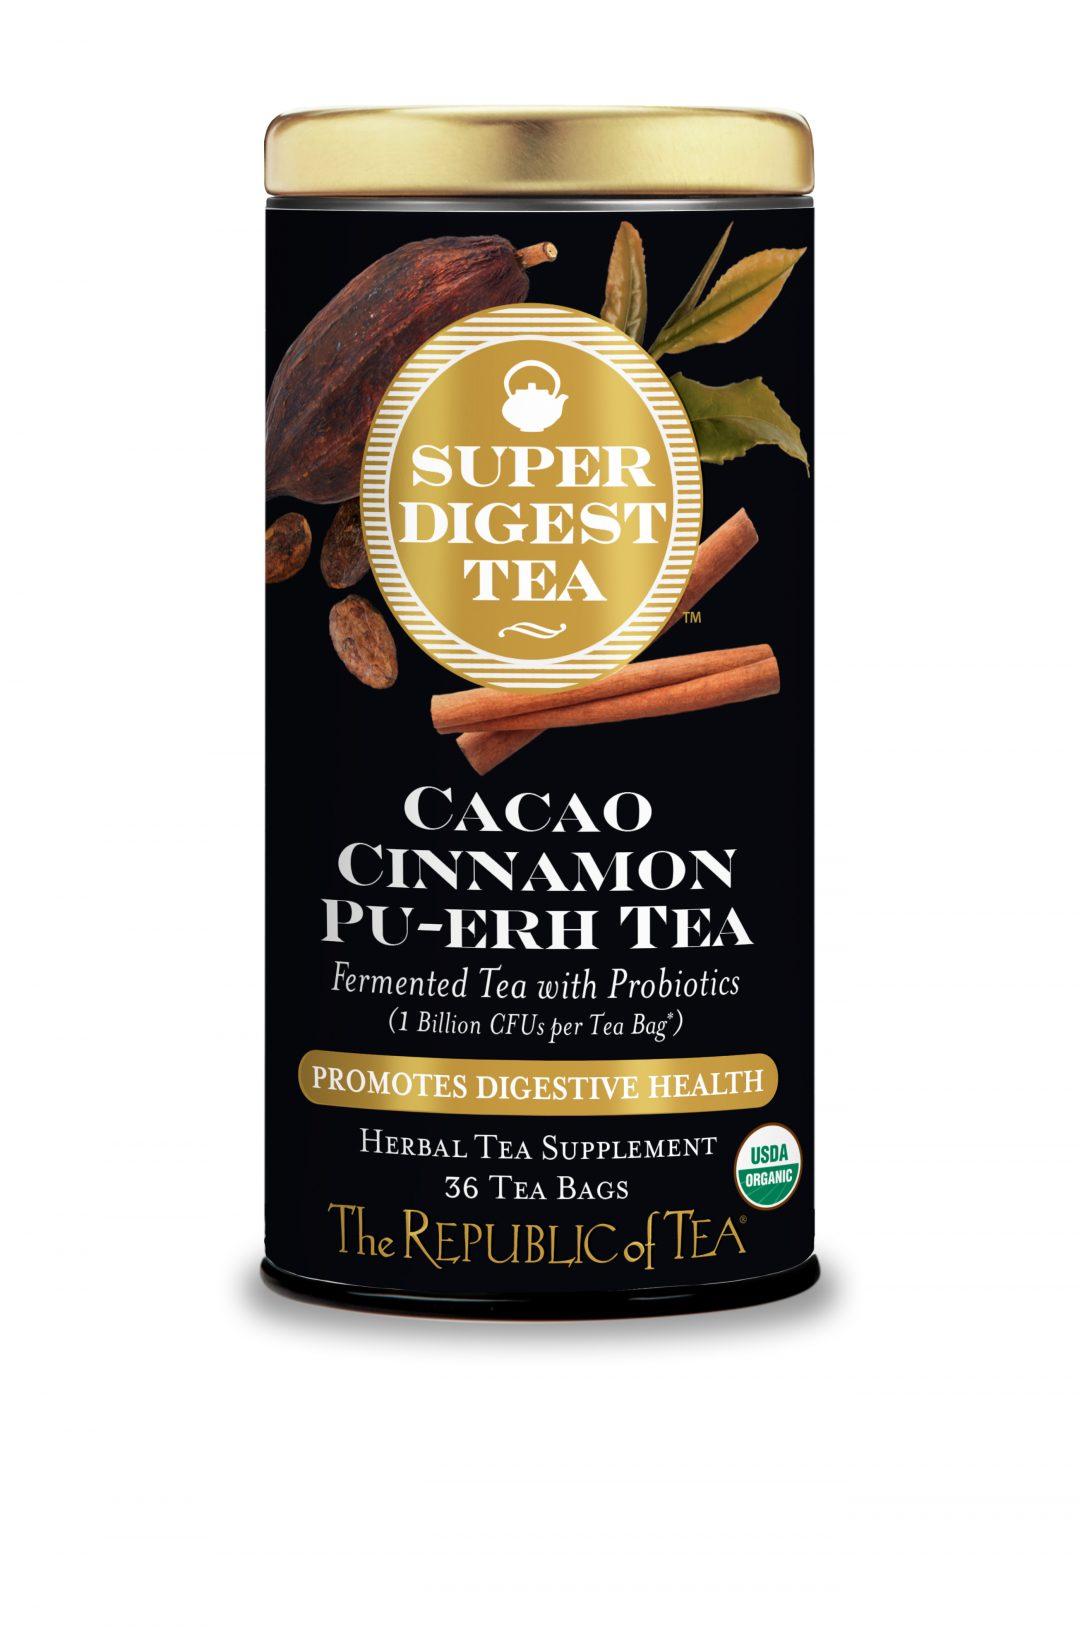 Organic Cacao Cinnamon Pu-erh SuperDigest Tea